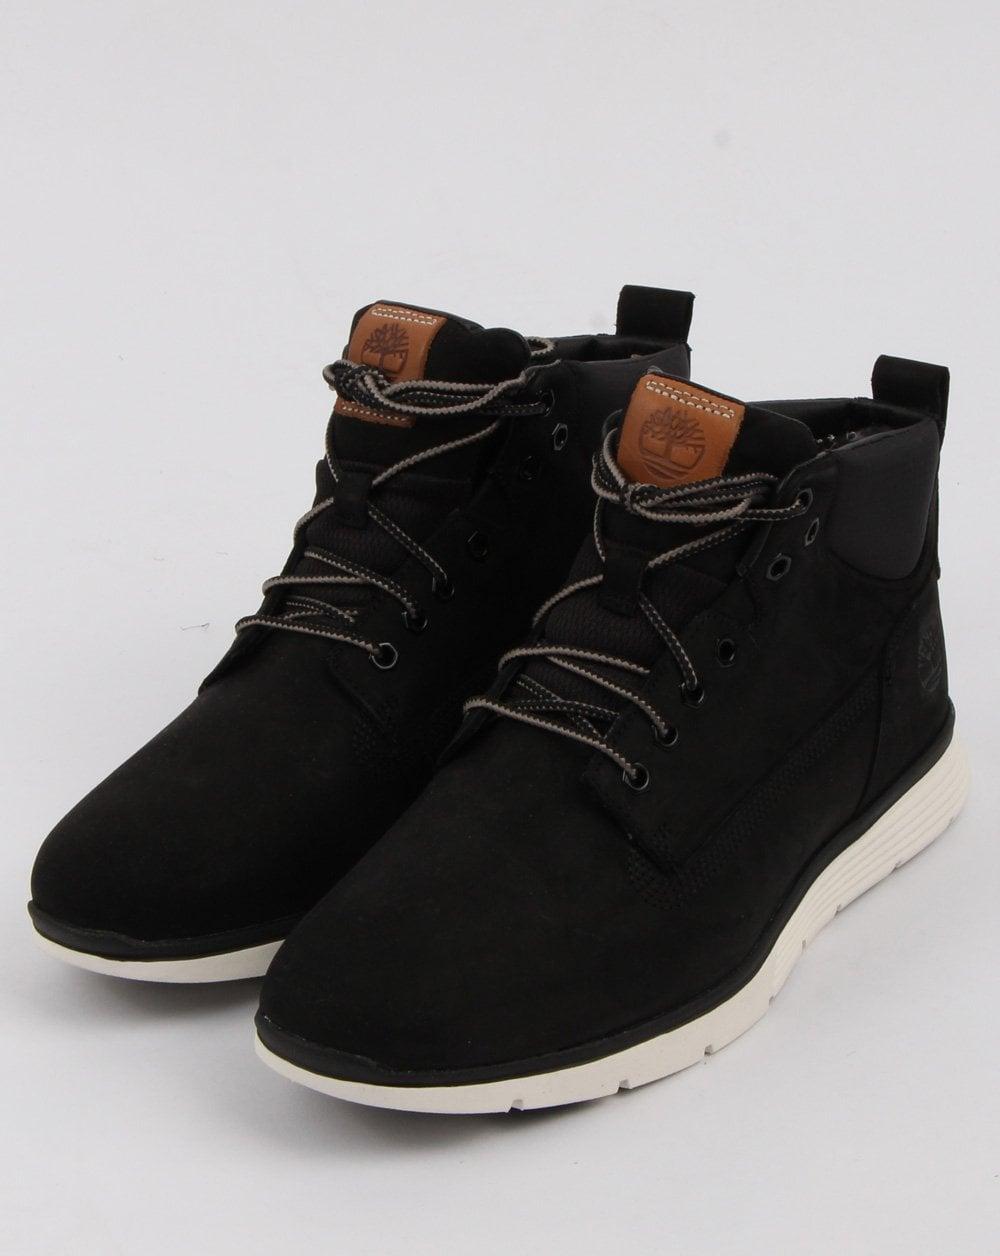 Timberland Killington Chukka Sneakers Le Black